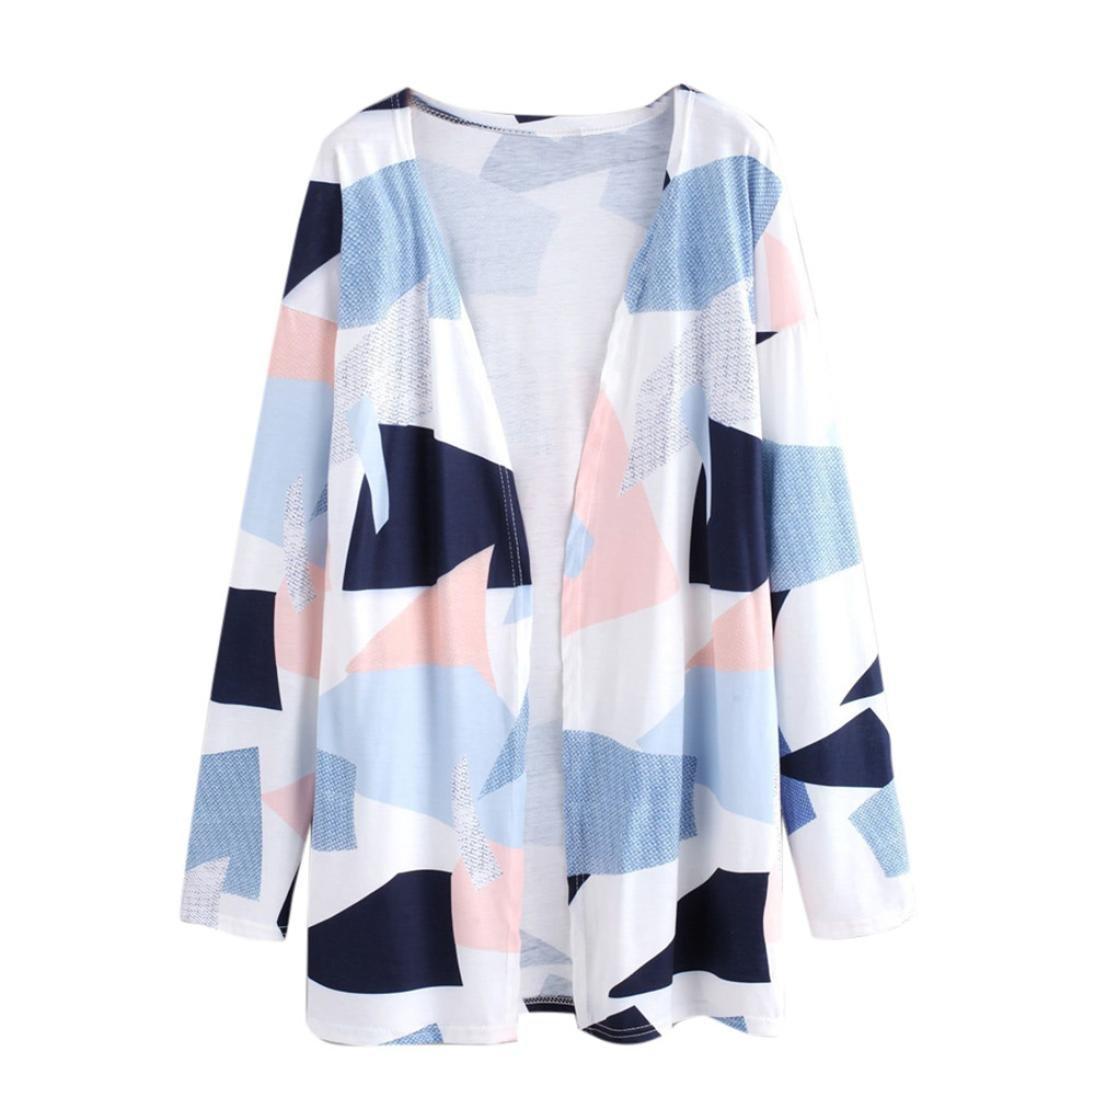 BCDshop Fashion Women Print Loose Shawl Kimono Cardigan Top Cover up Shirt Blouse (M) by BCDshop